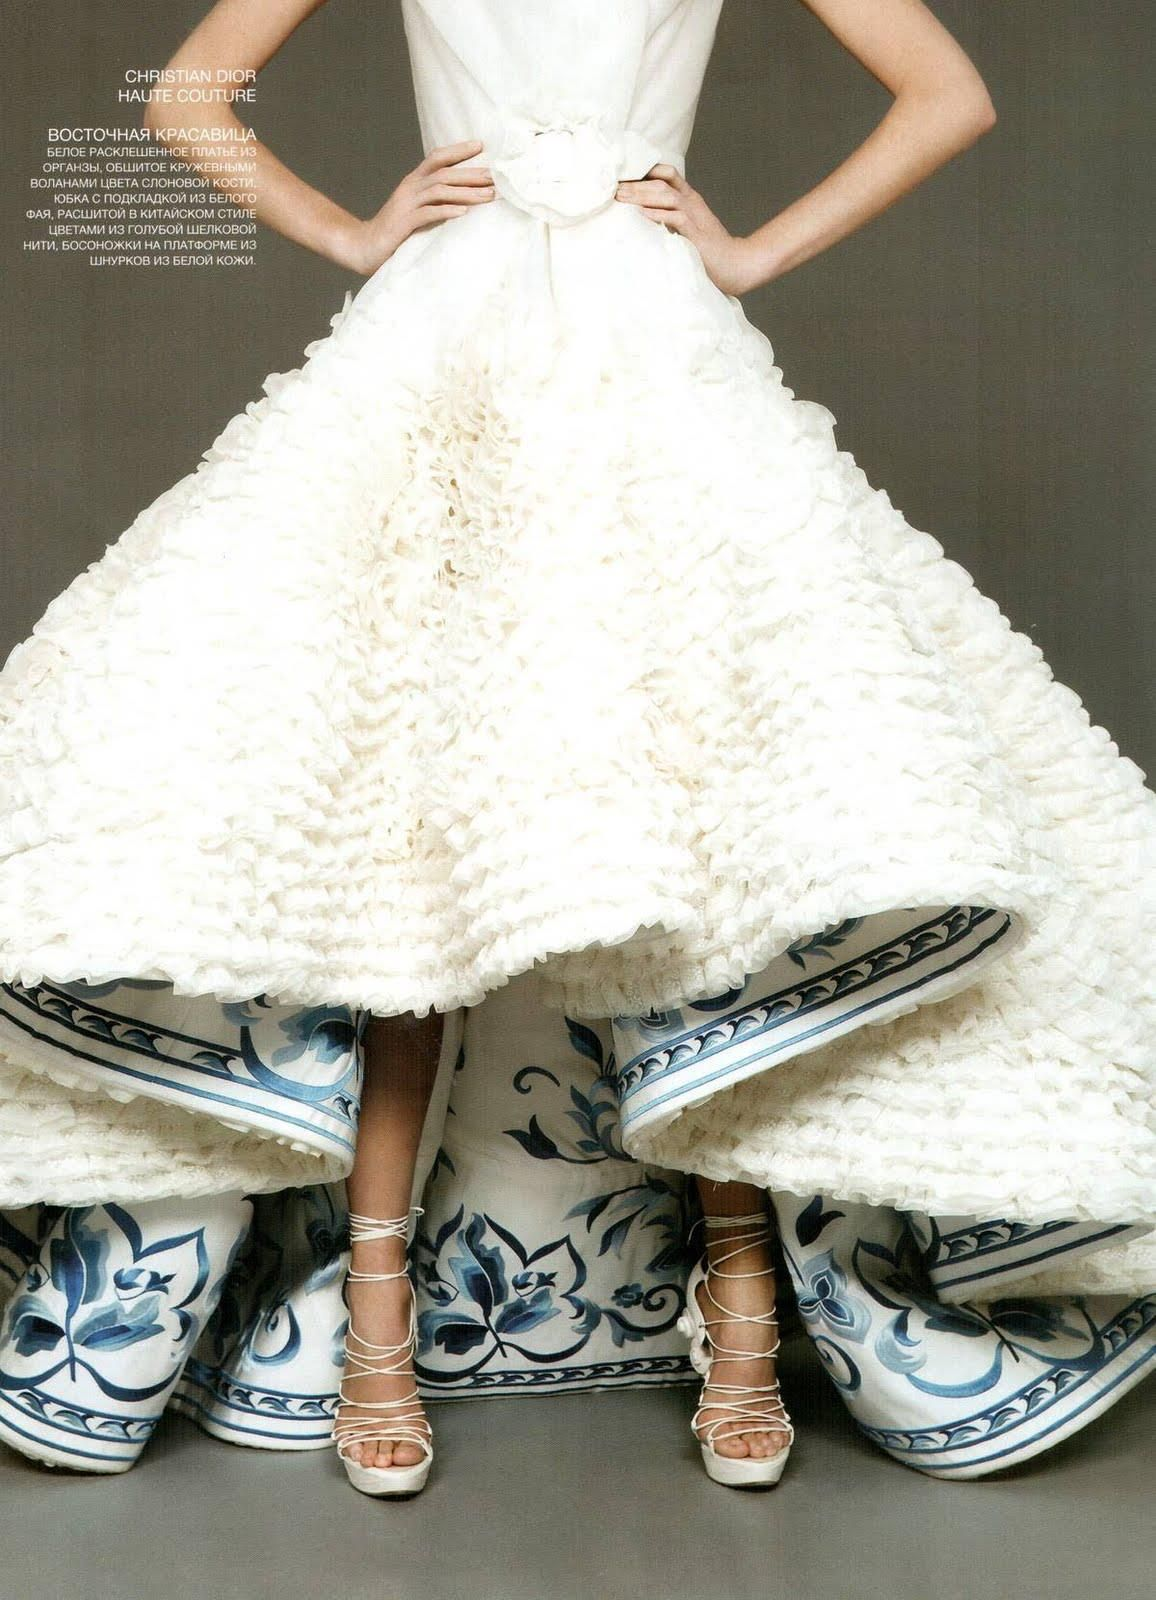 I will wear a wedding dress with dutch inspirations wedding dress